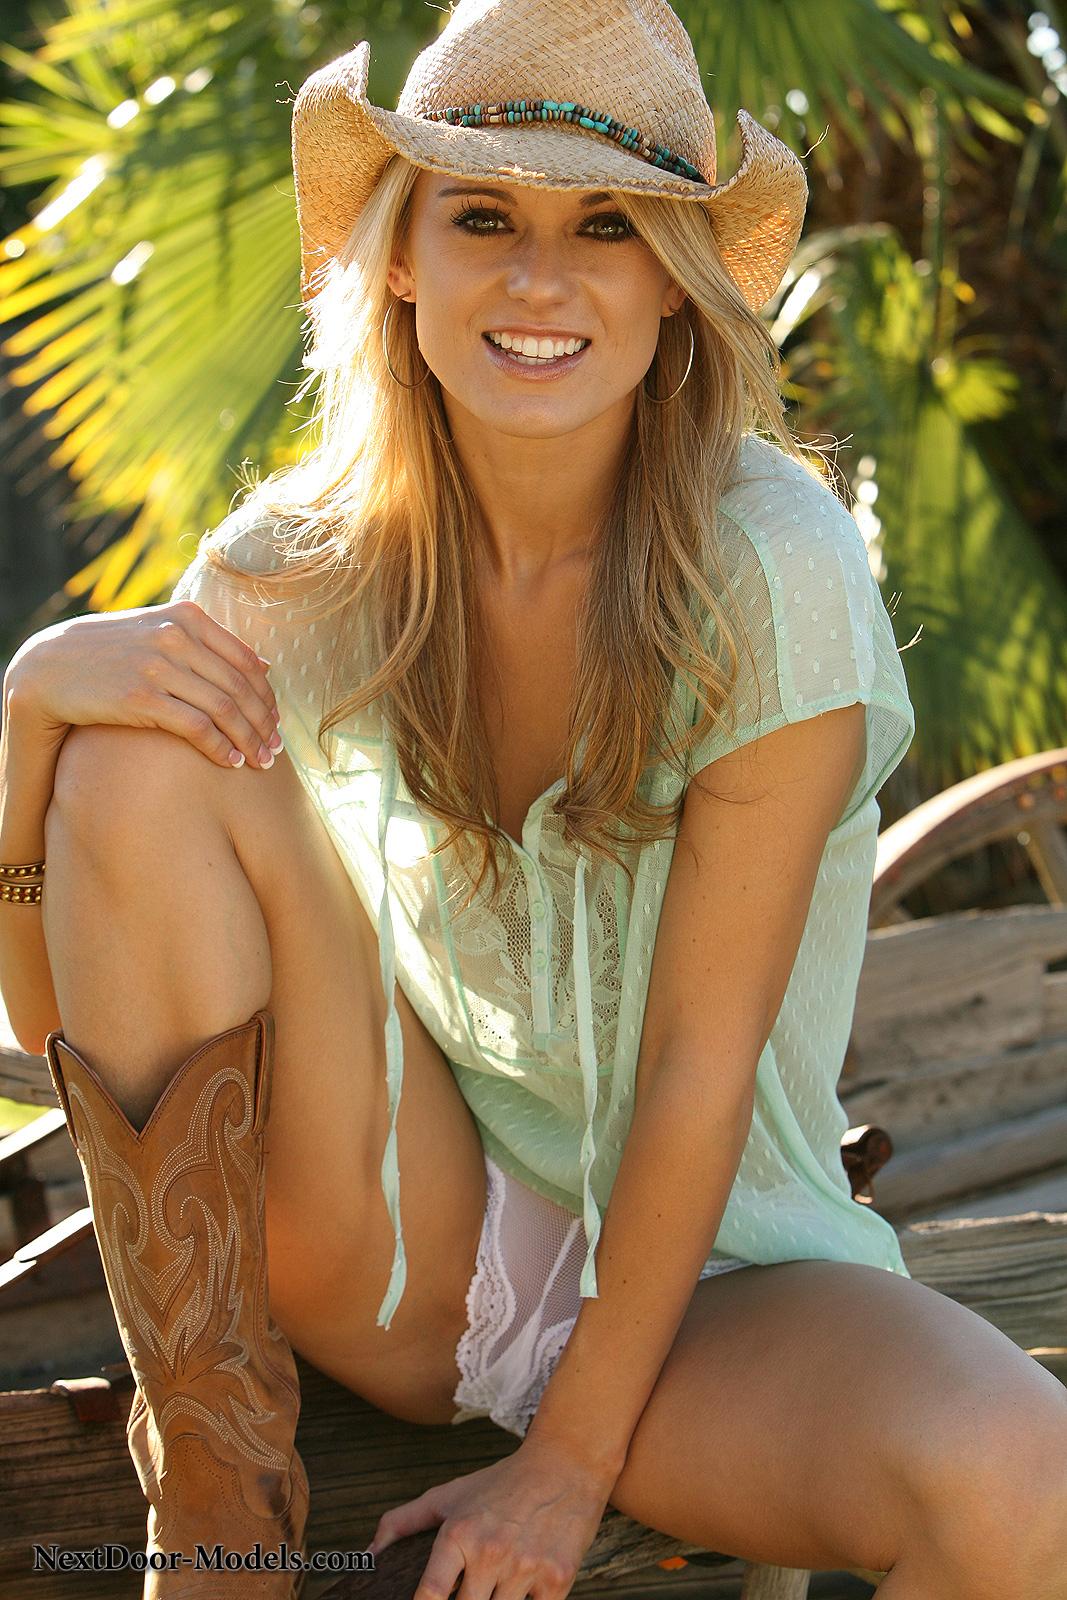 Nicole Jaimes in lingerie